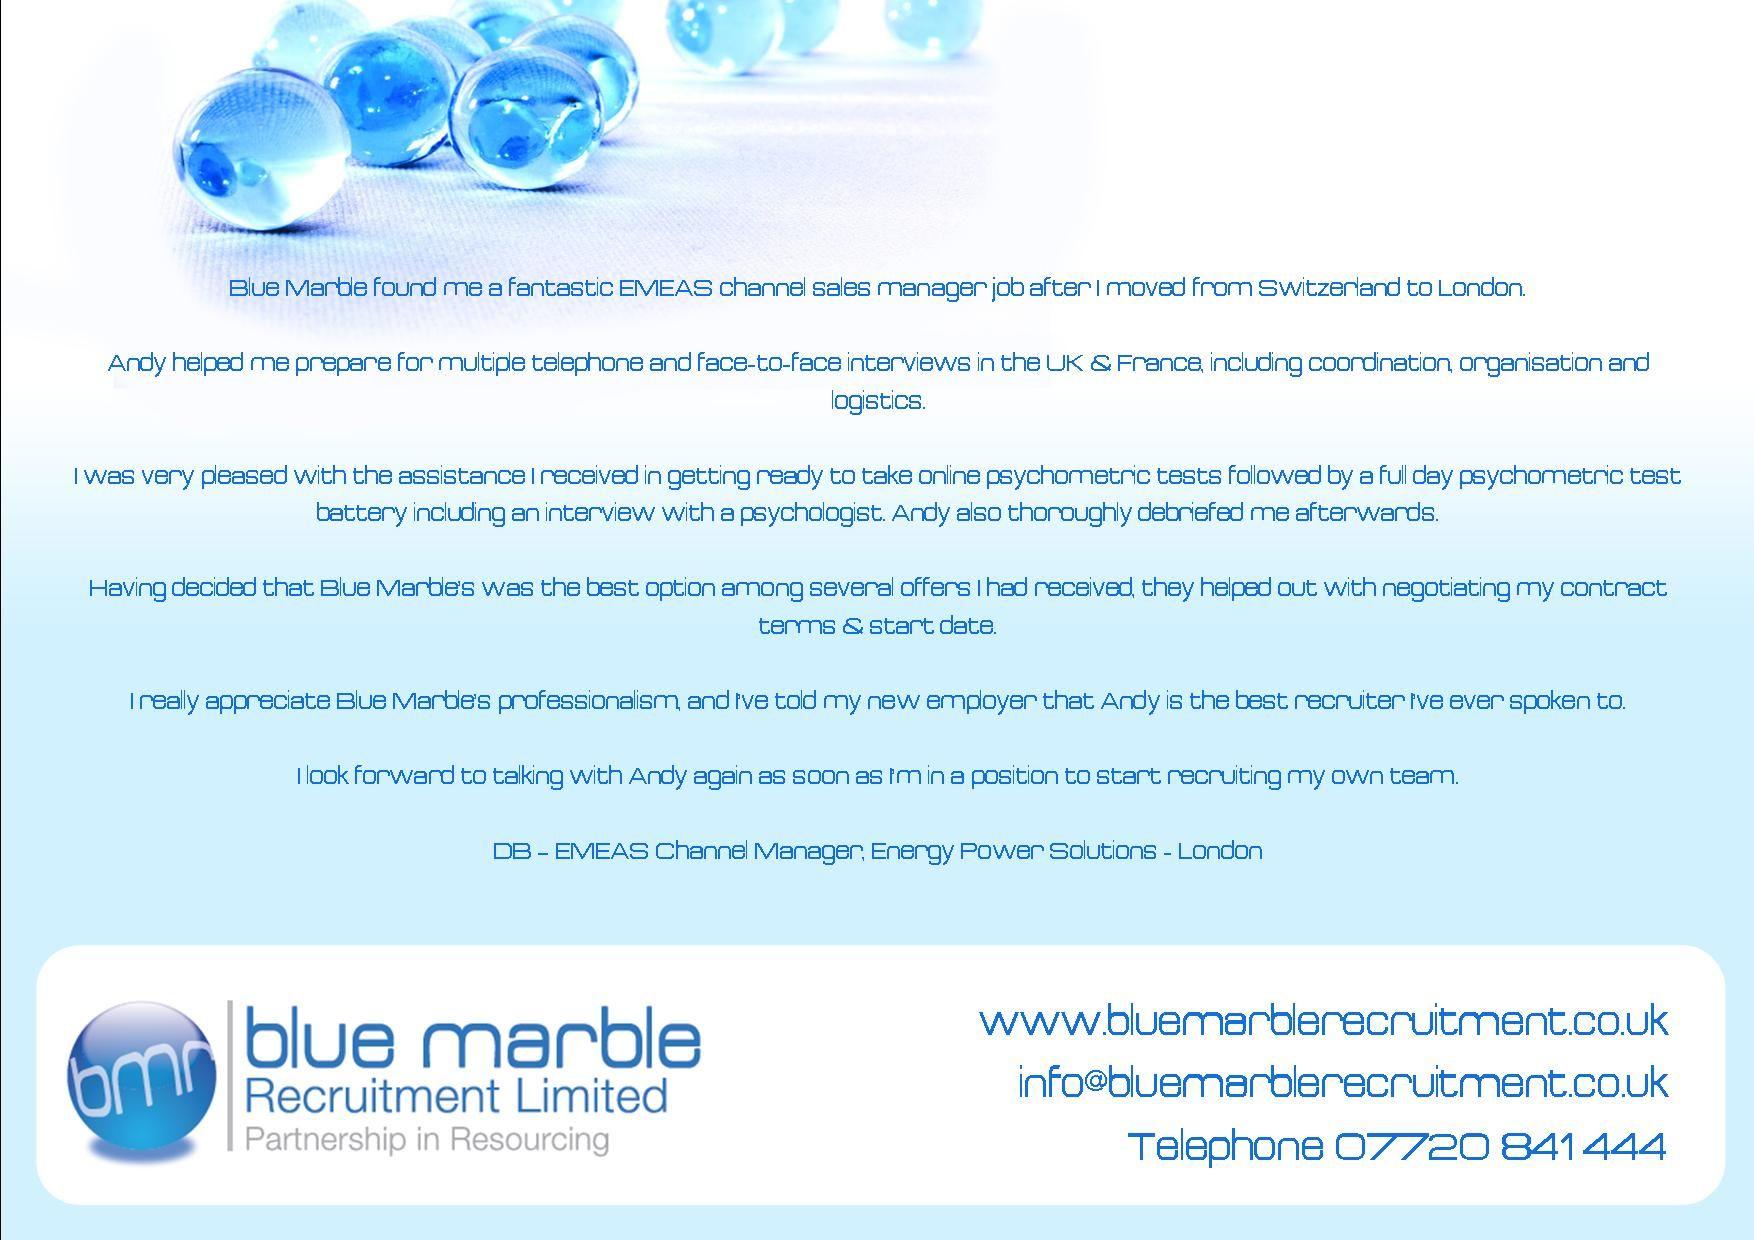 Blue Marble found me a fantastic EMEAS channel sales